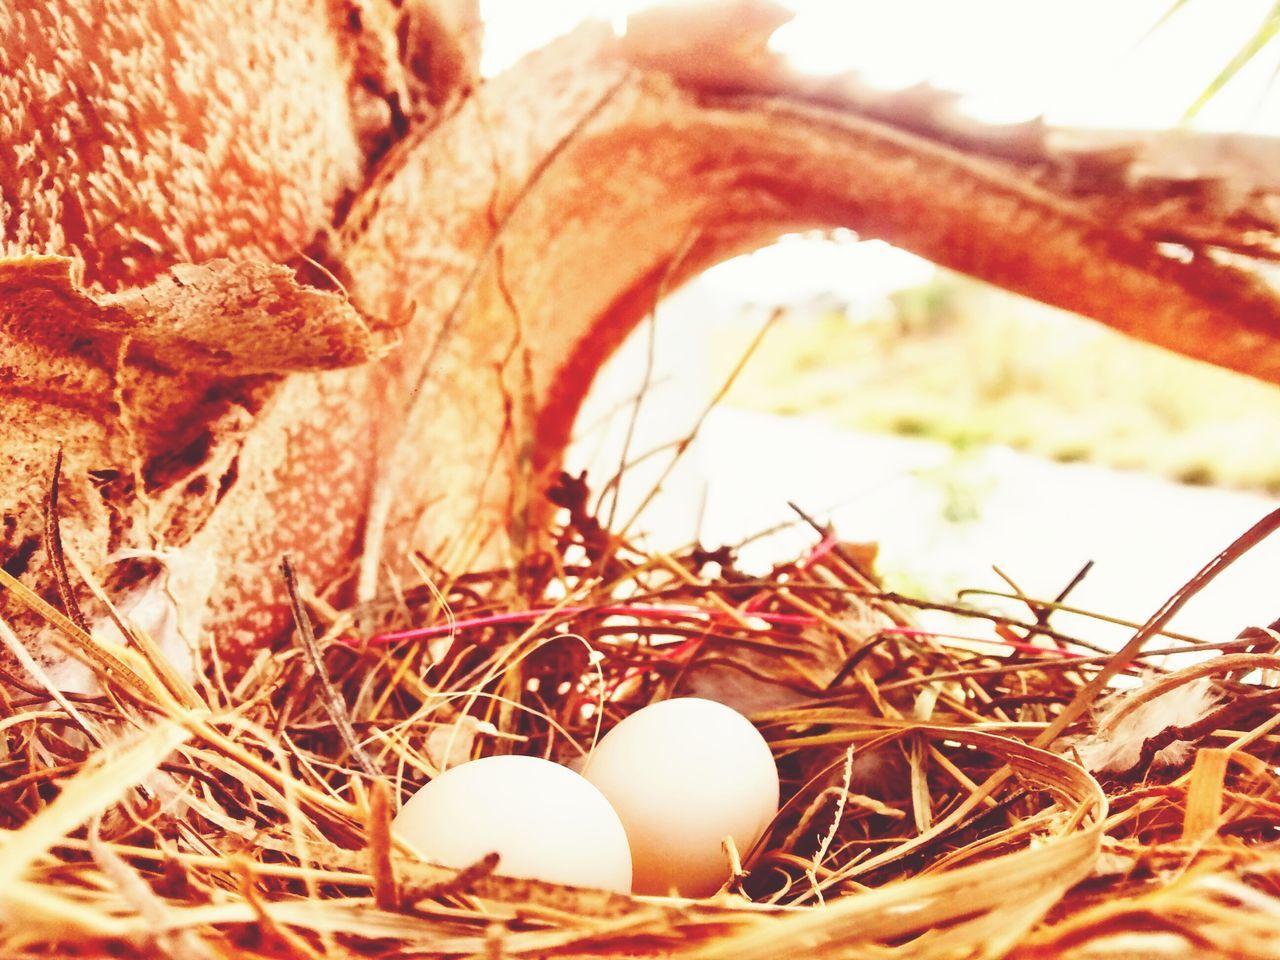 egg, animal egg, new life, fragility, bird nest, no people, cracked, close-up, day, outdoors, nature, animal themes